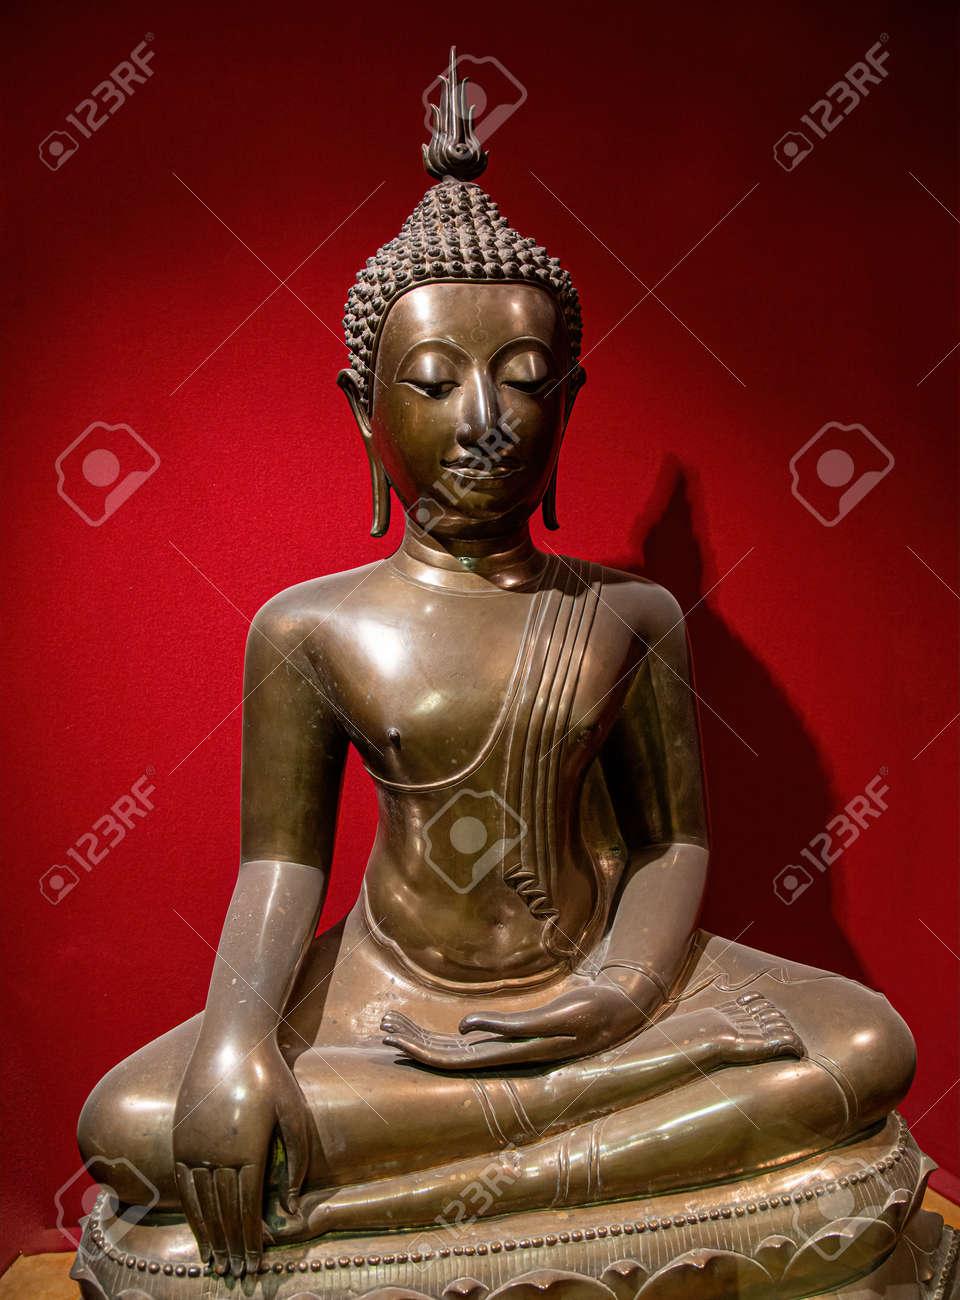 Buddha statue in calm rest pose. Shakyamuni Buddha is a spiritual teacher, one of the three world religions. Siddhartha Gautama Siddhattha Gotama - 169669158